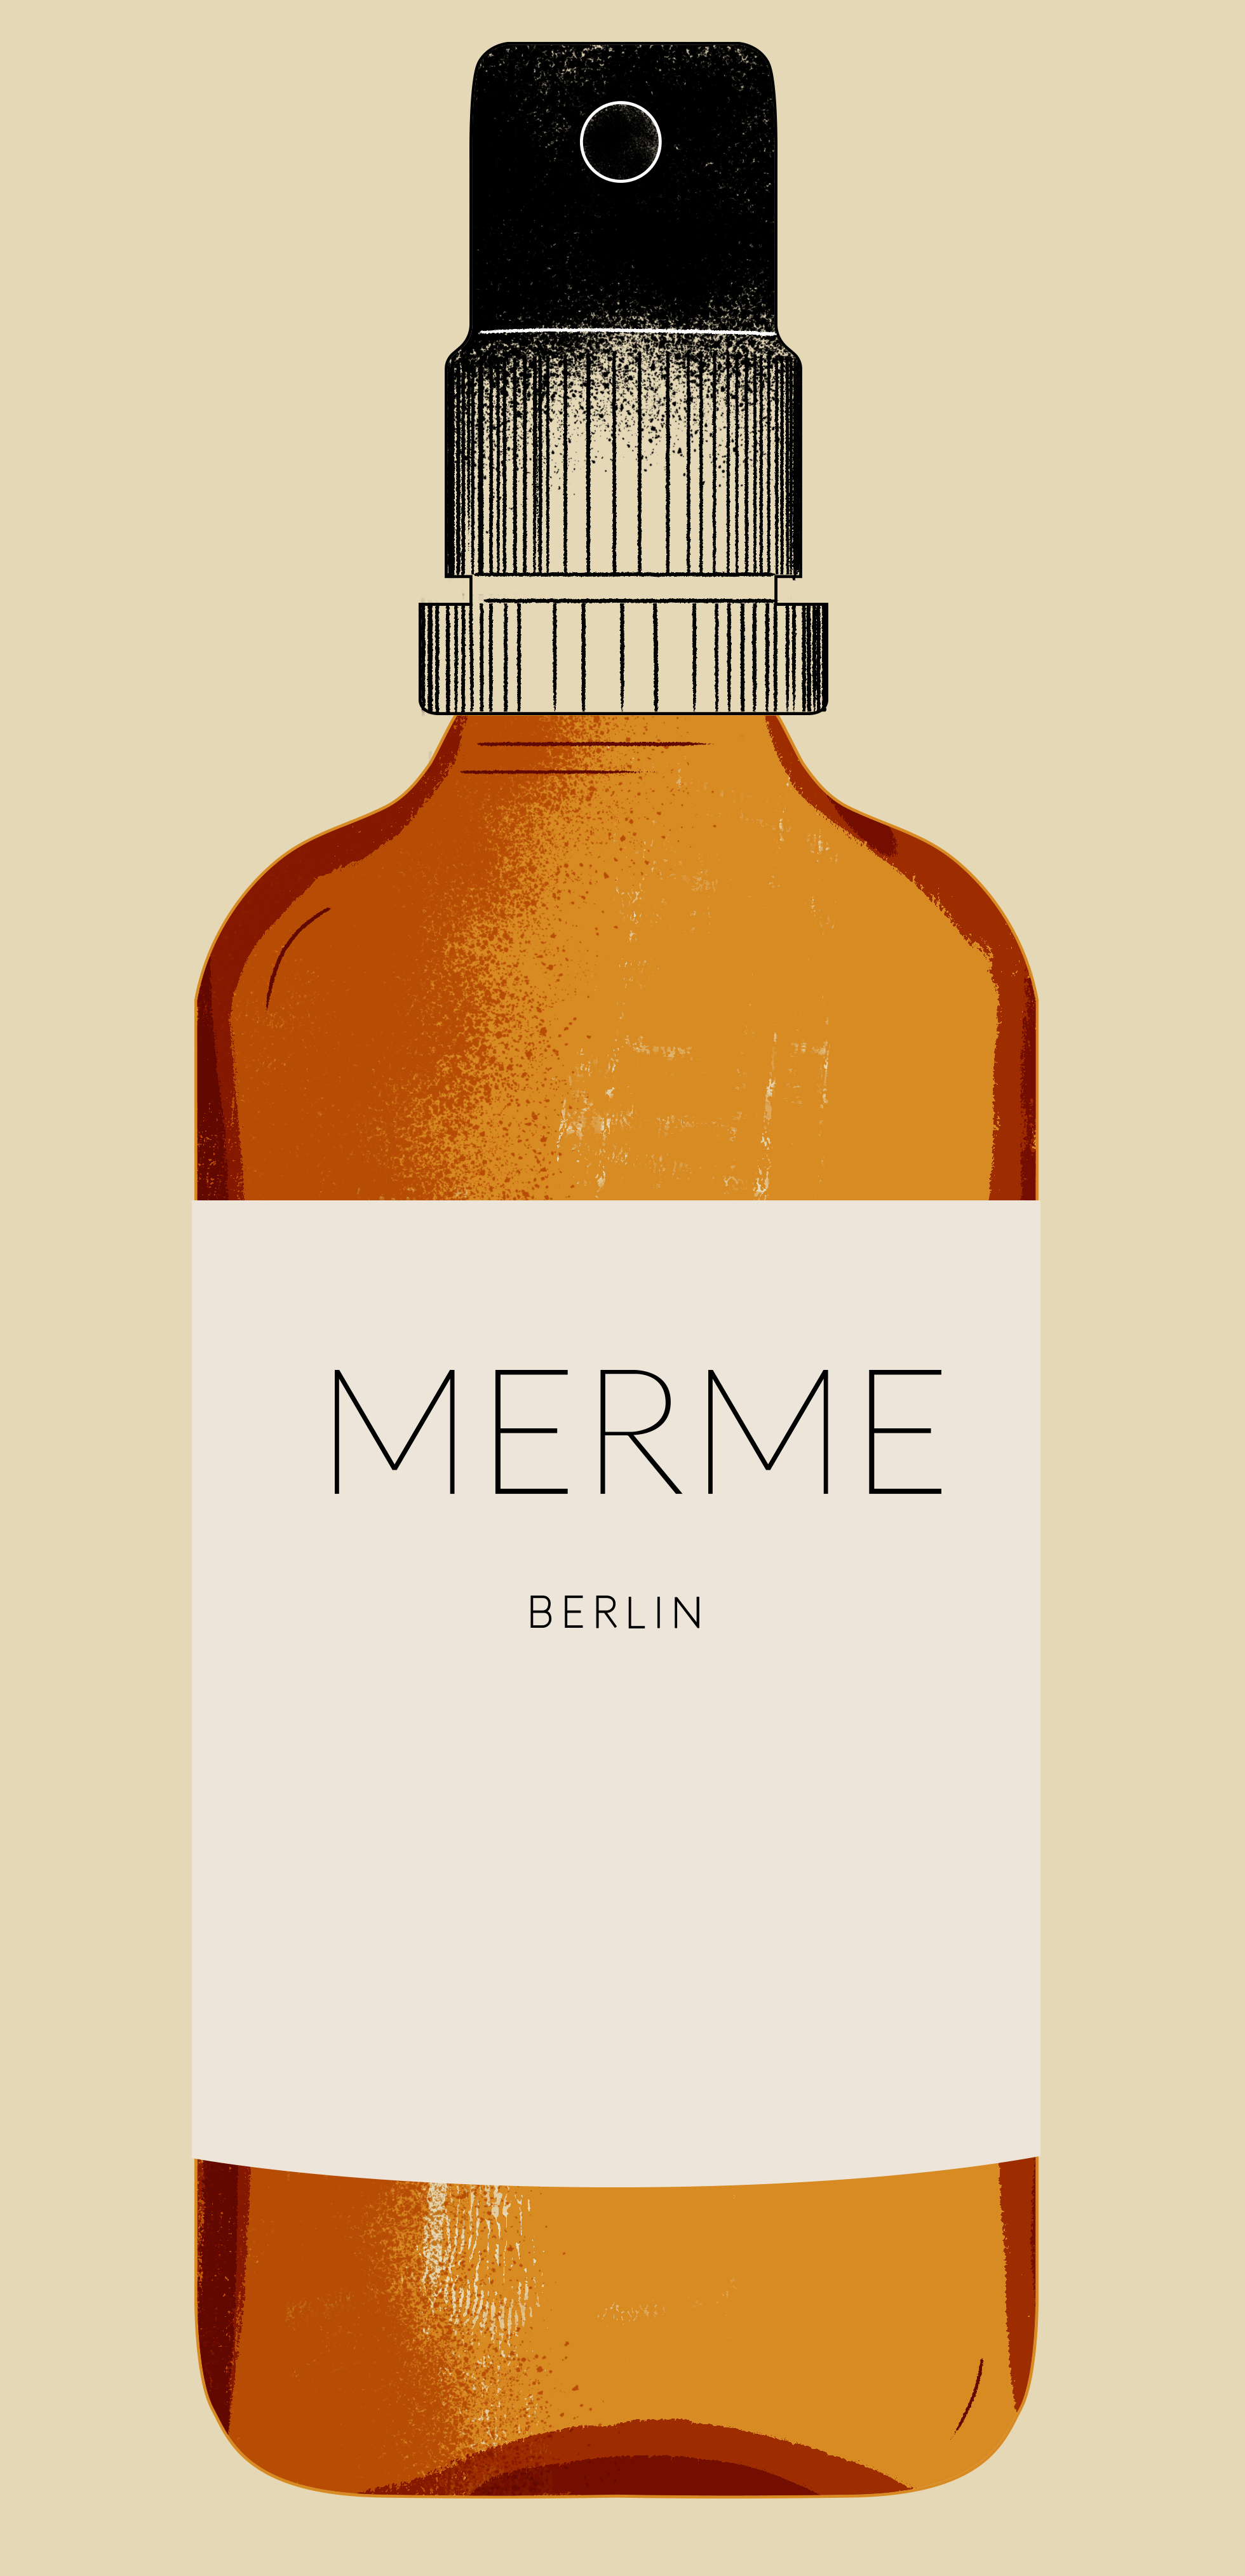 WH_01_06_merme.png